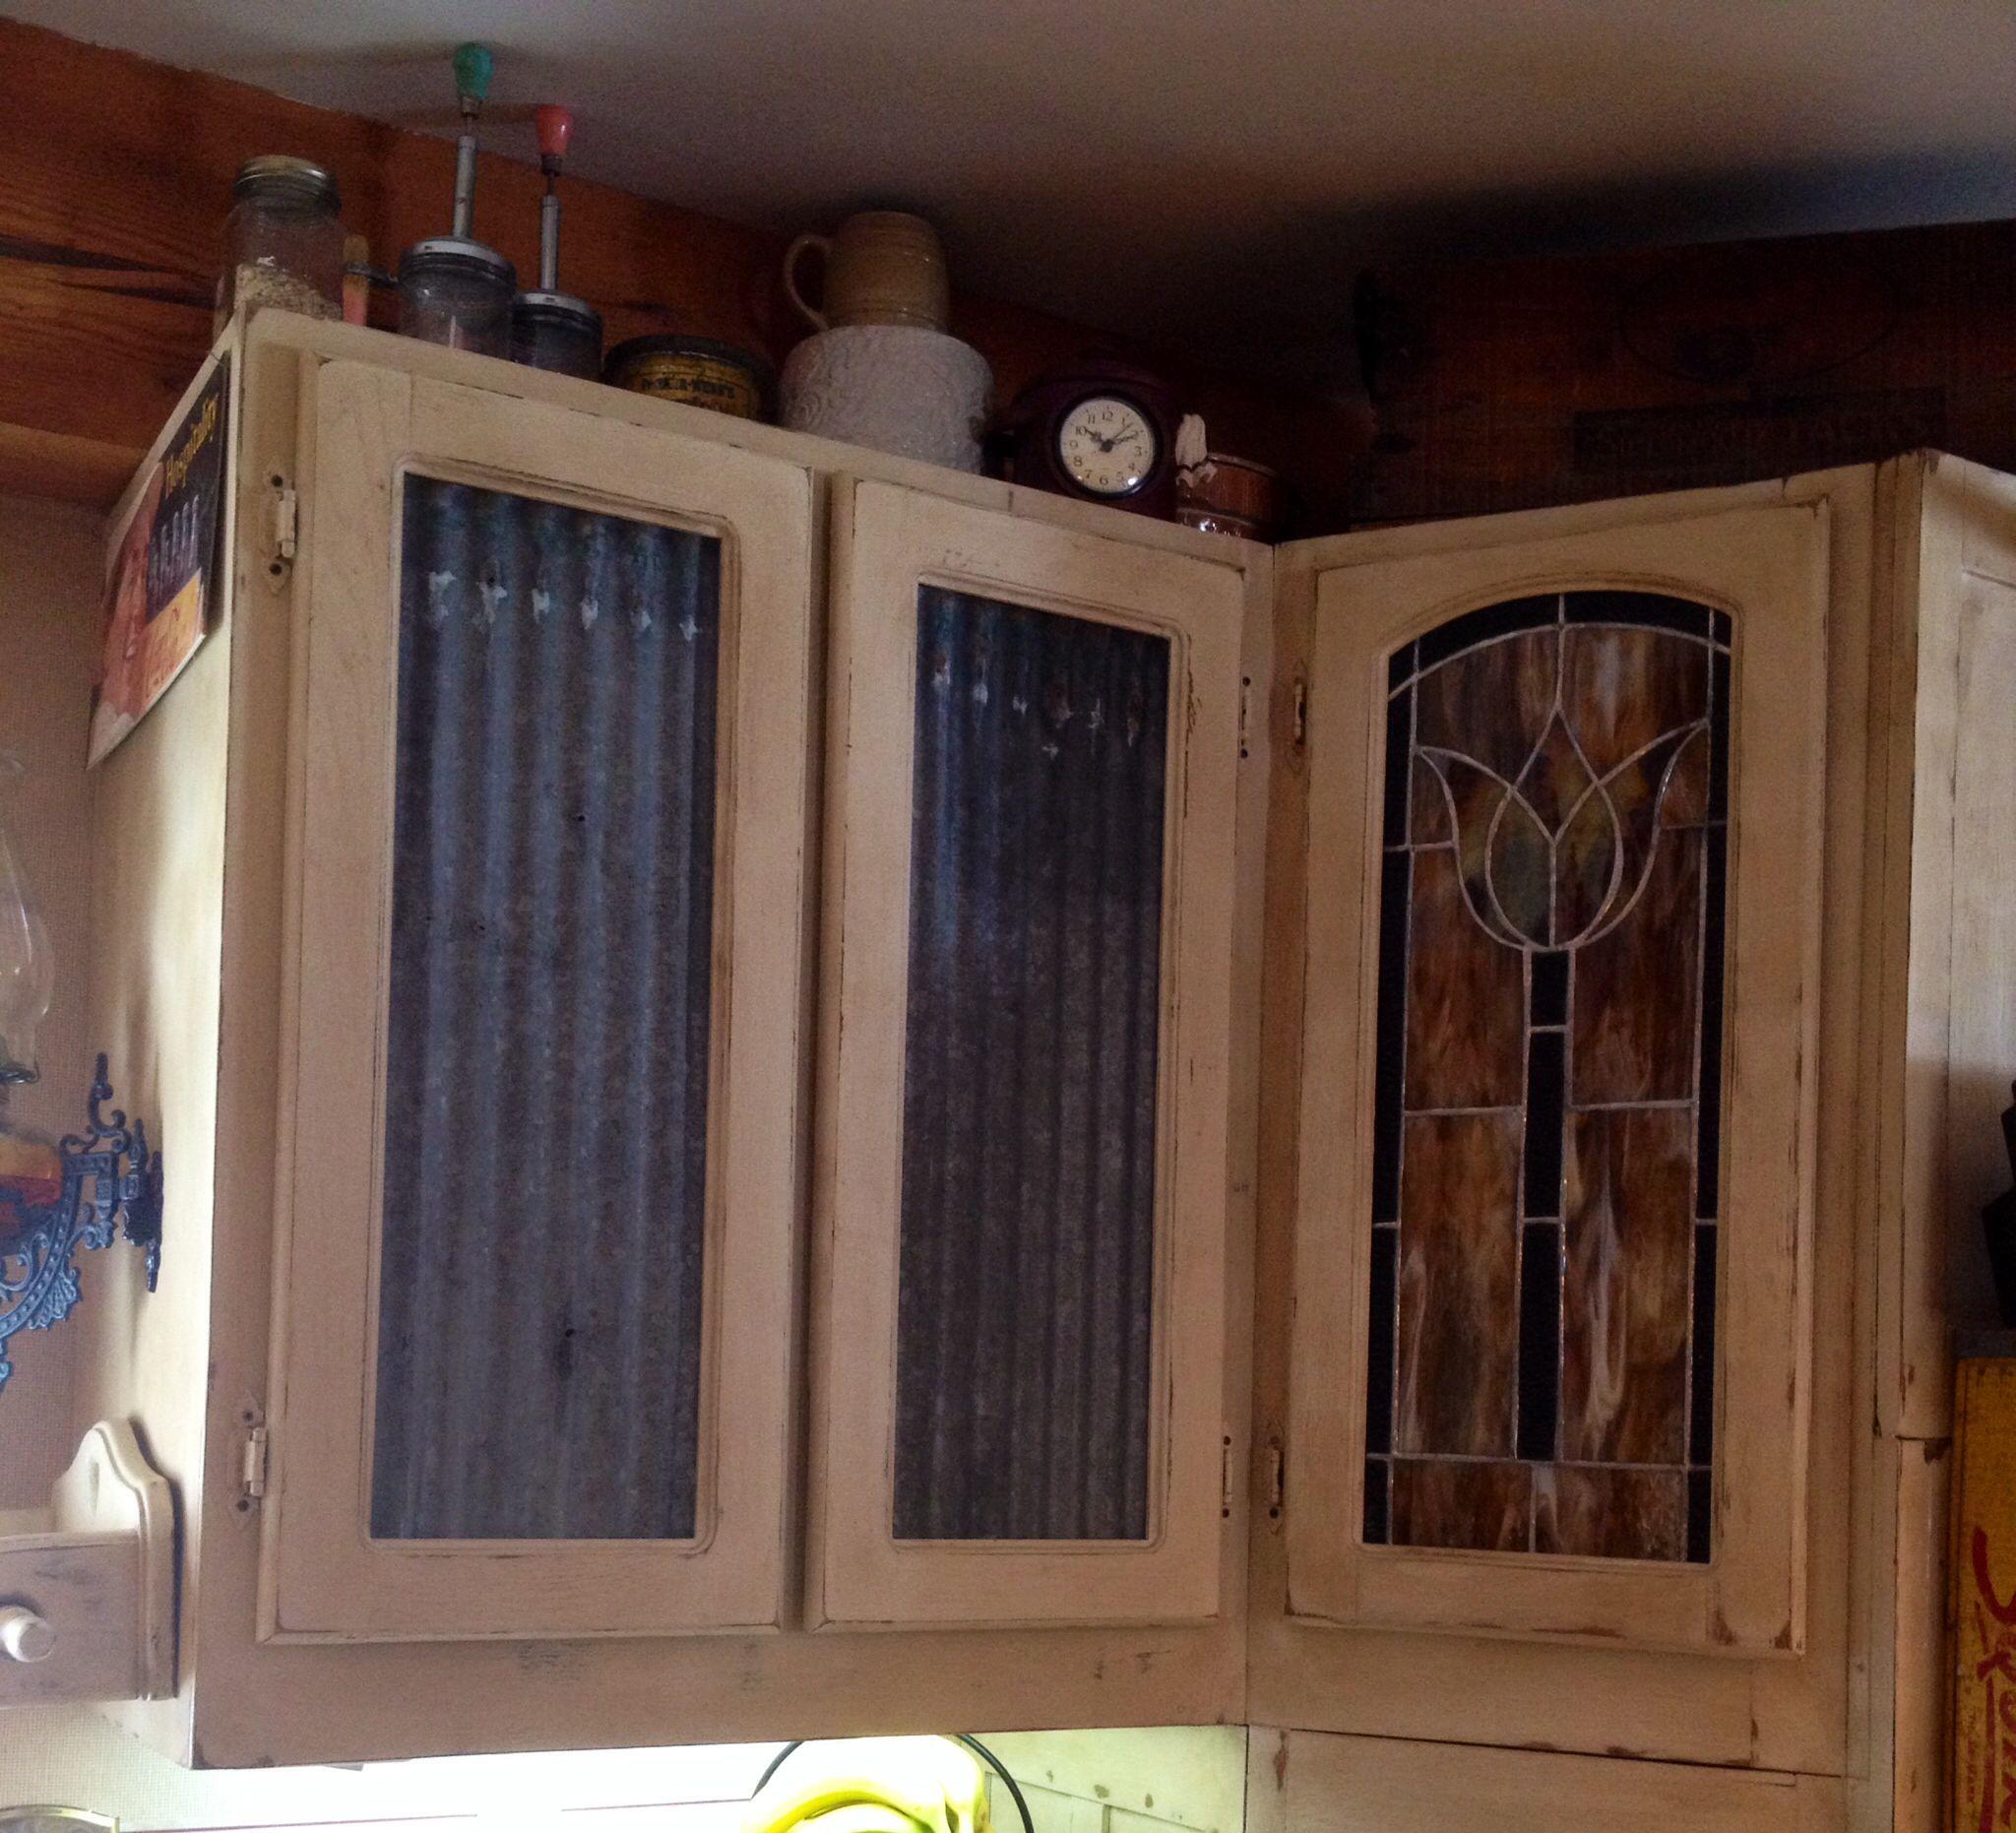 Old galvanized roof panels for door inserts. Diy